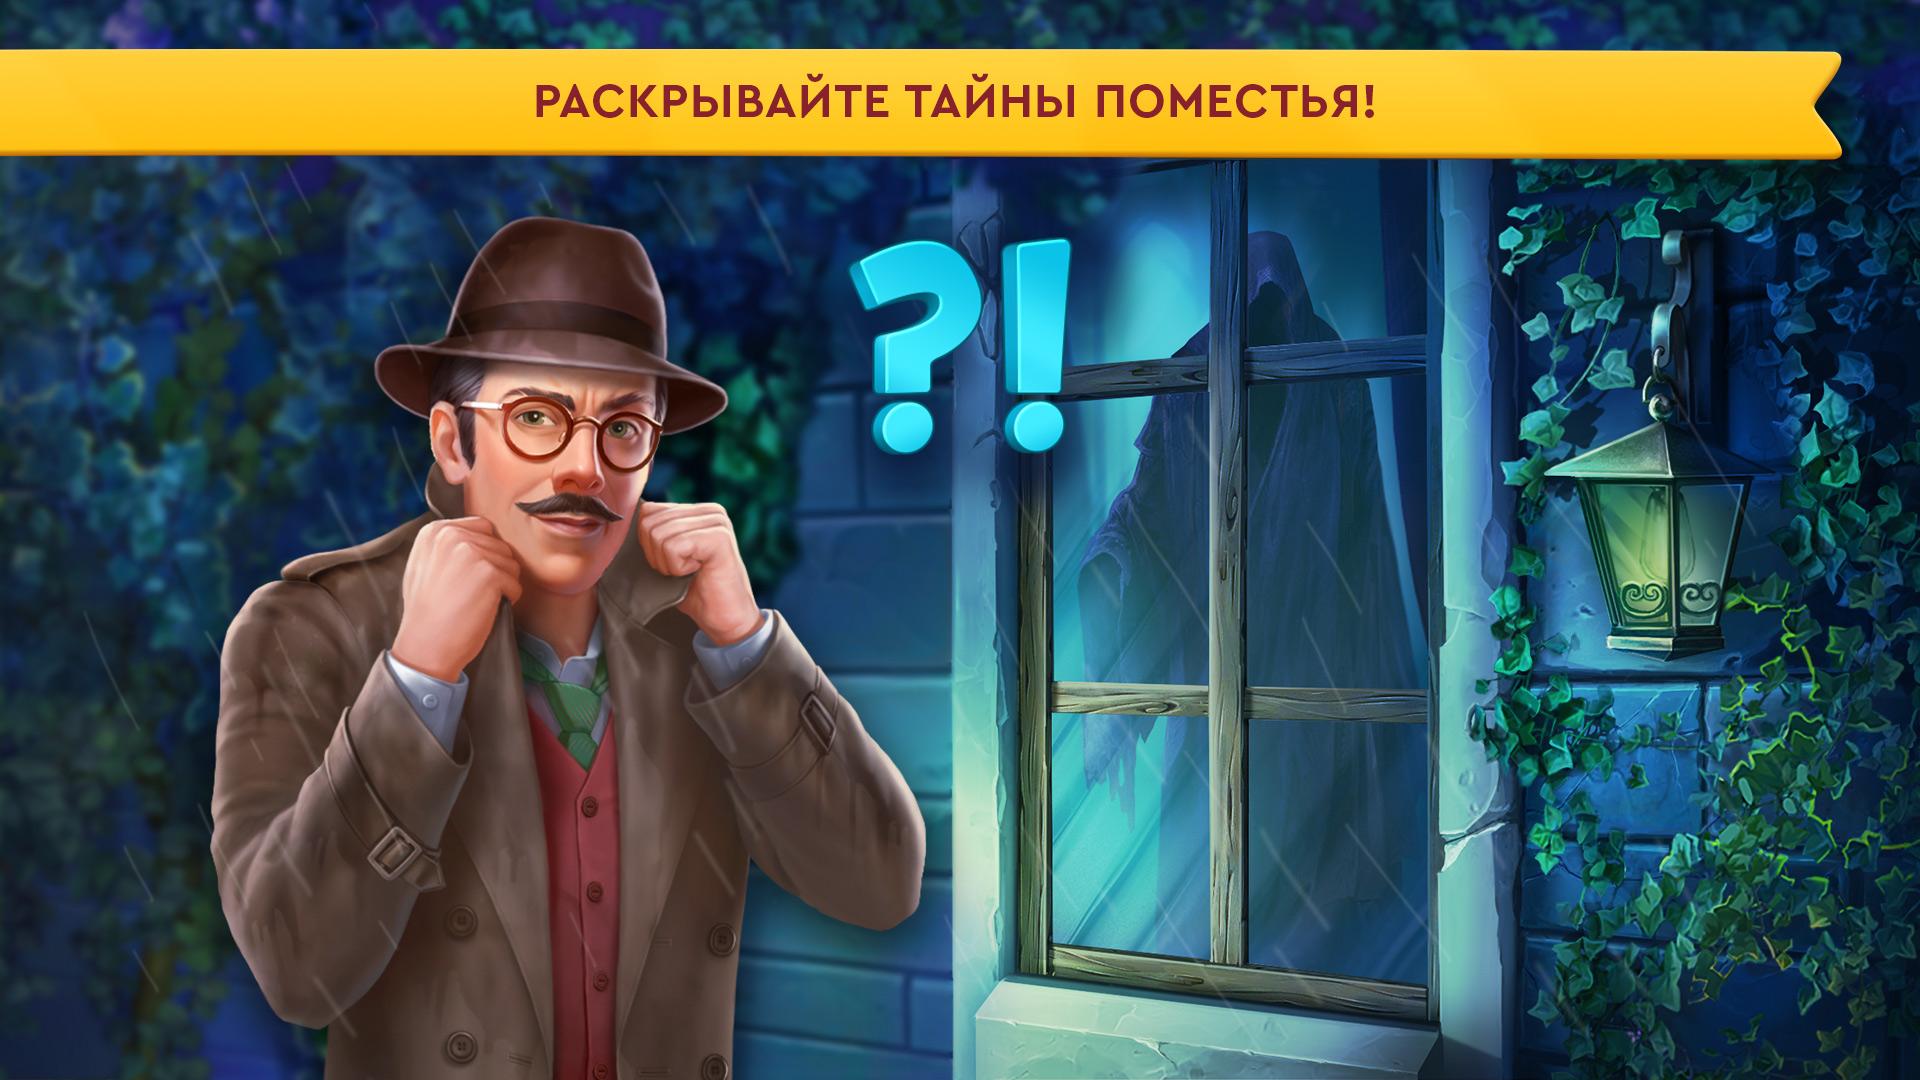 Post_3_ru_